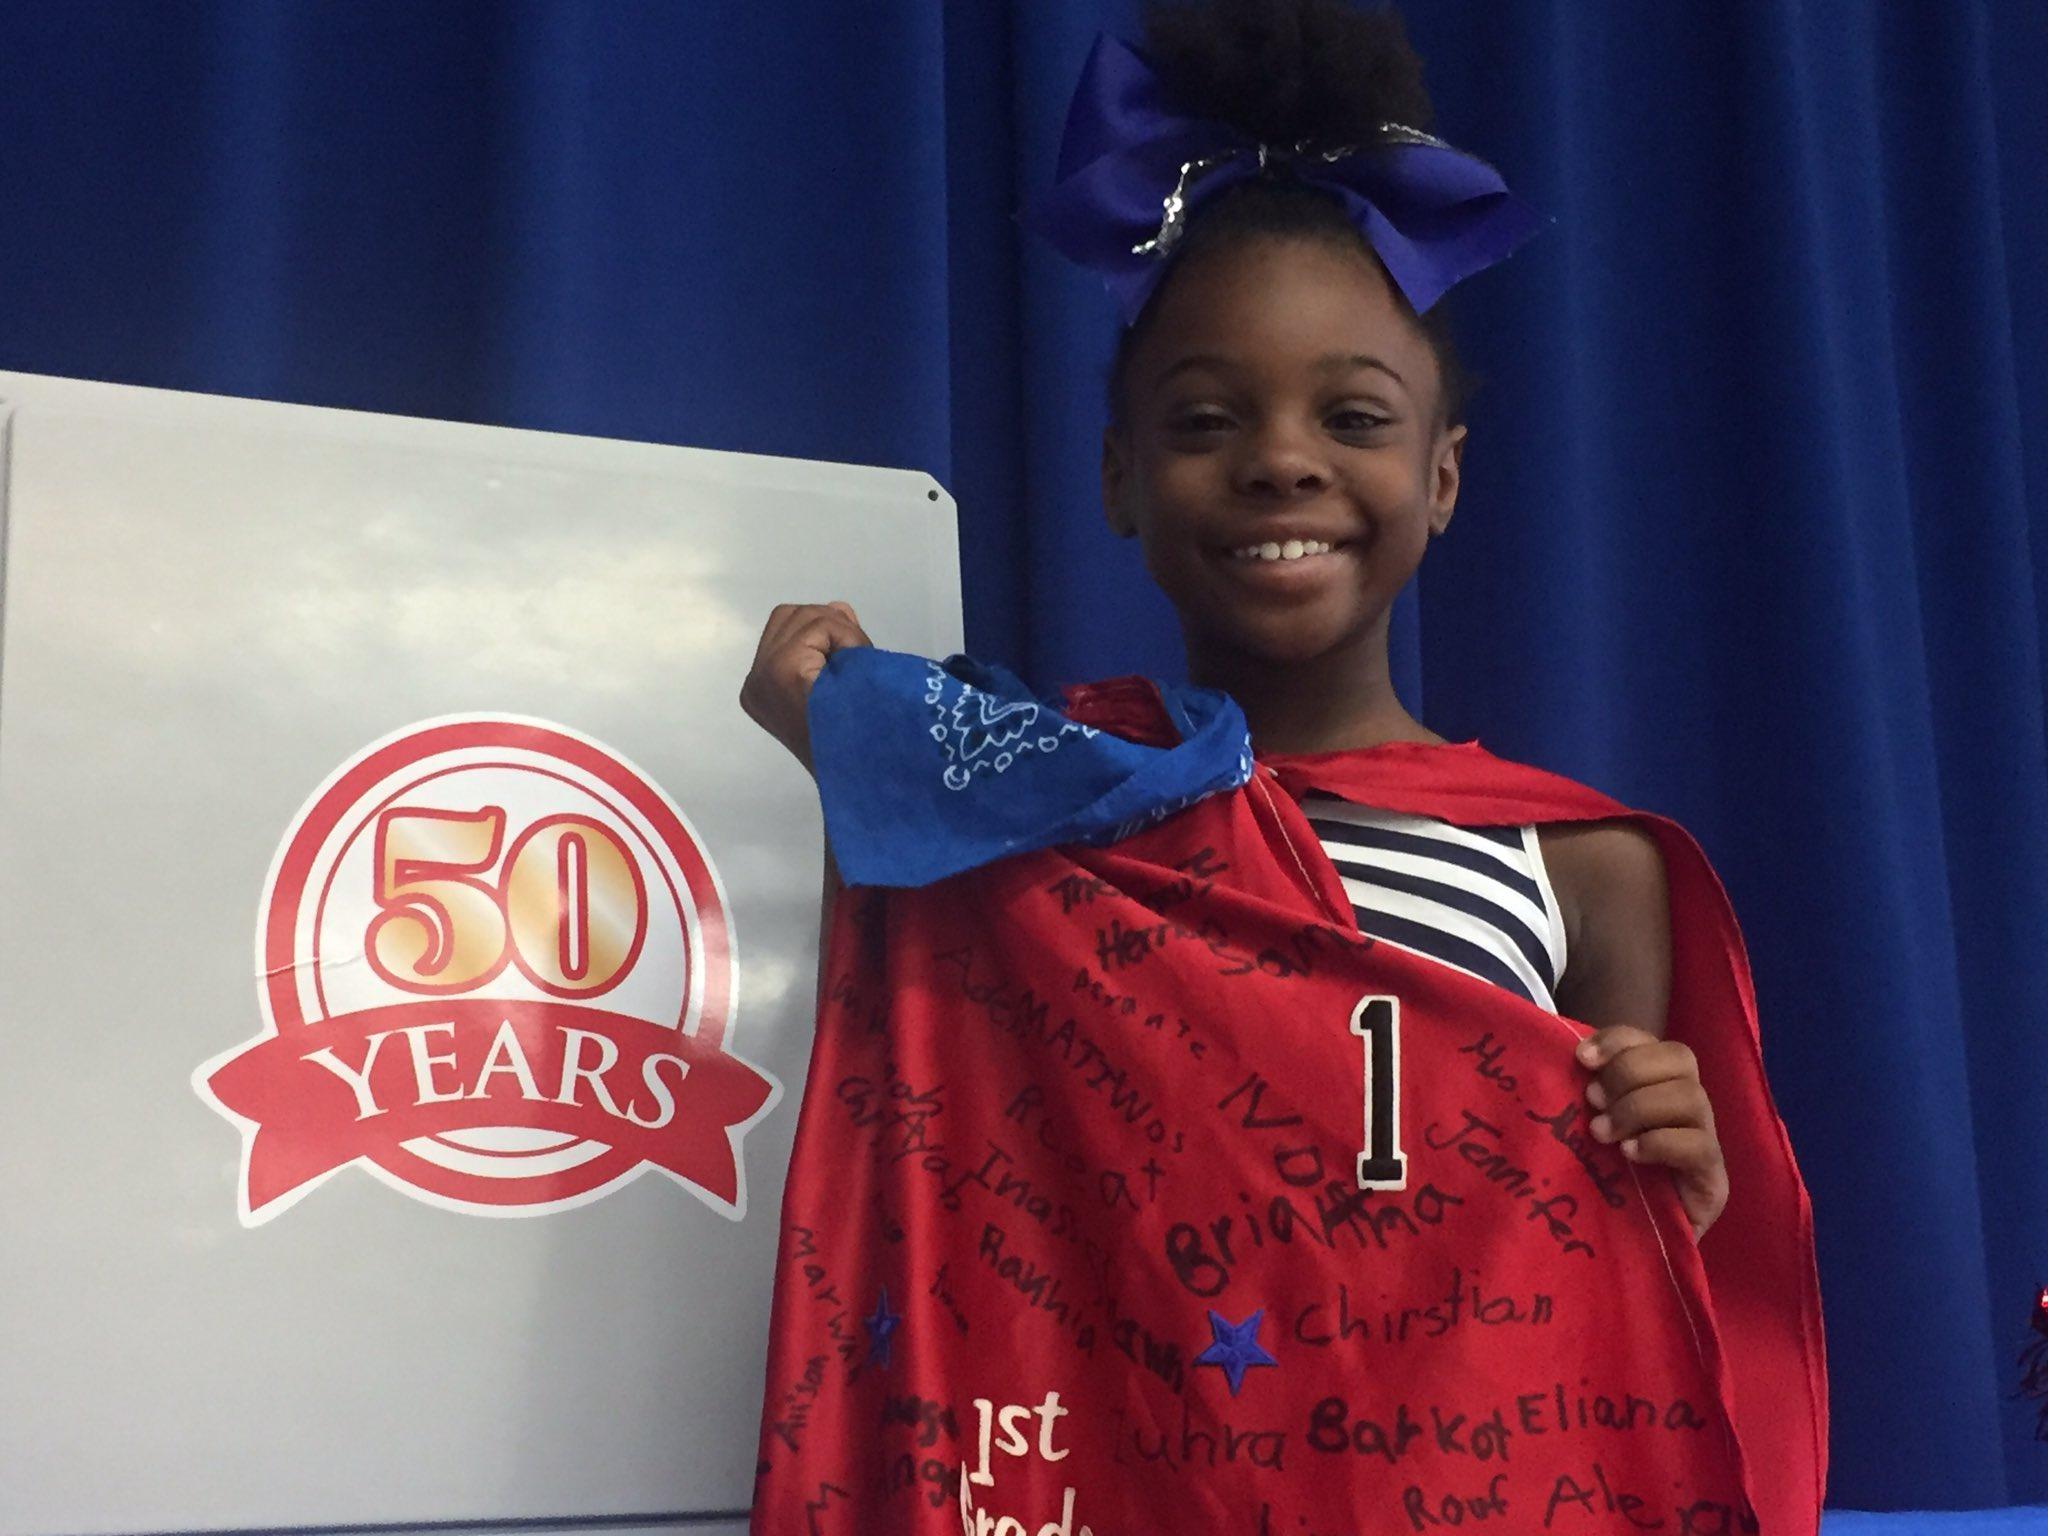 Thumbnail for John Adams Elementary Celebrates 50th Anniversary